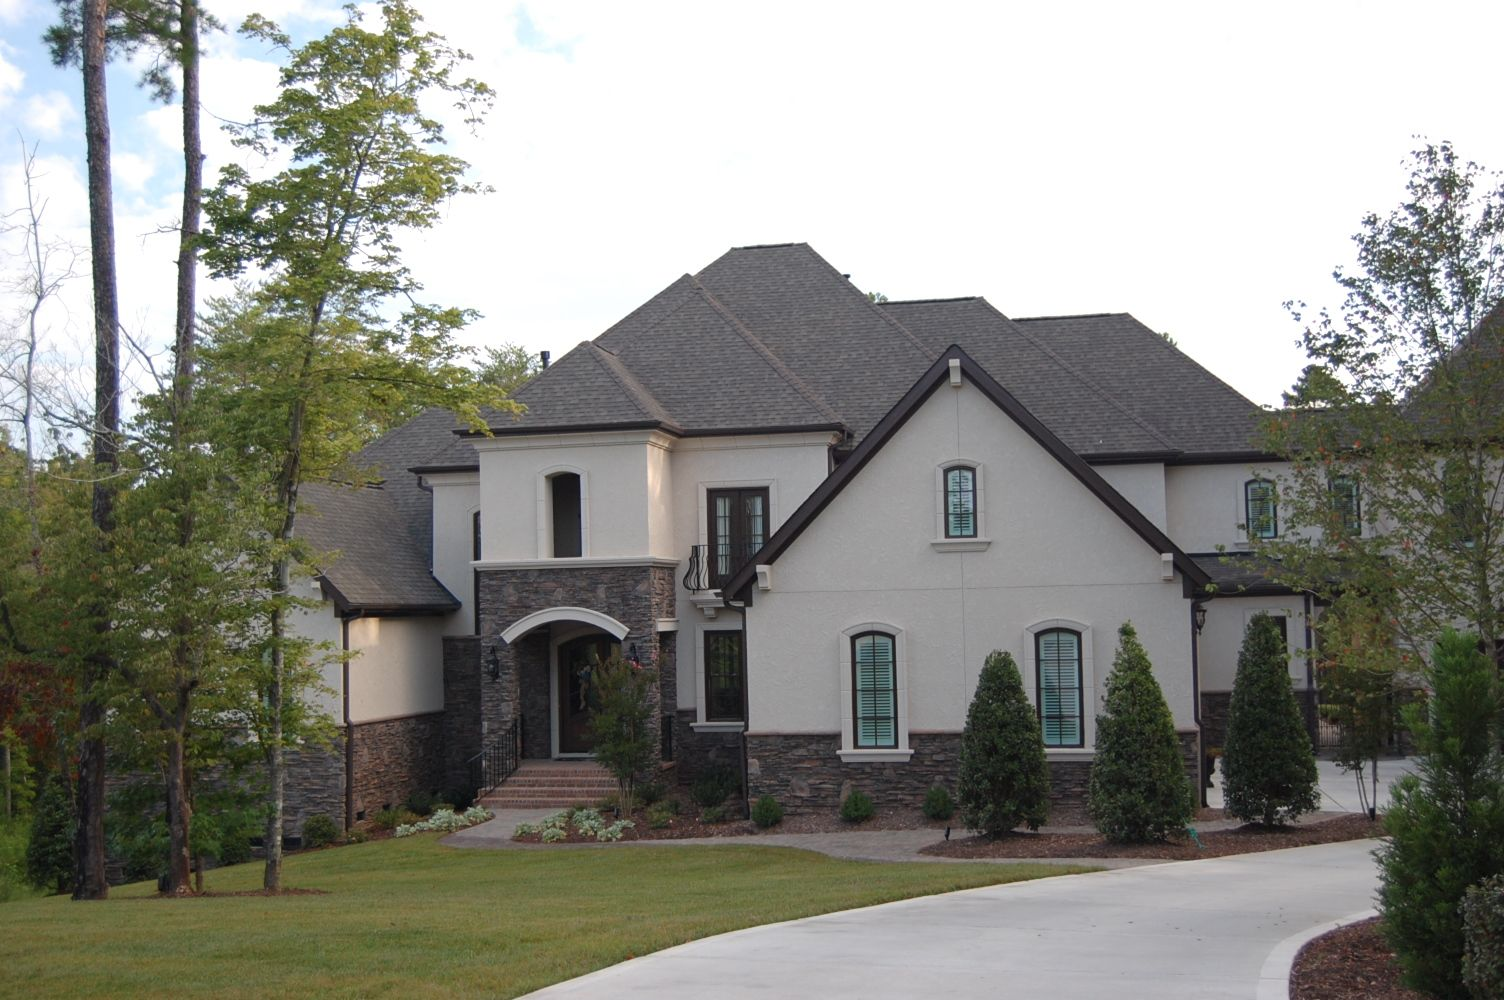 ARH plan Huntington 1064F (Exterior 12) Roof = Owens